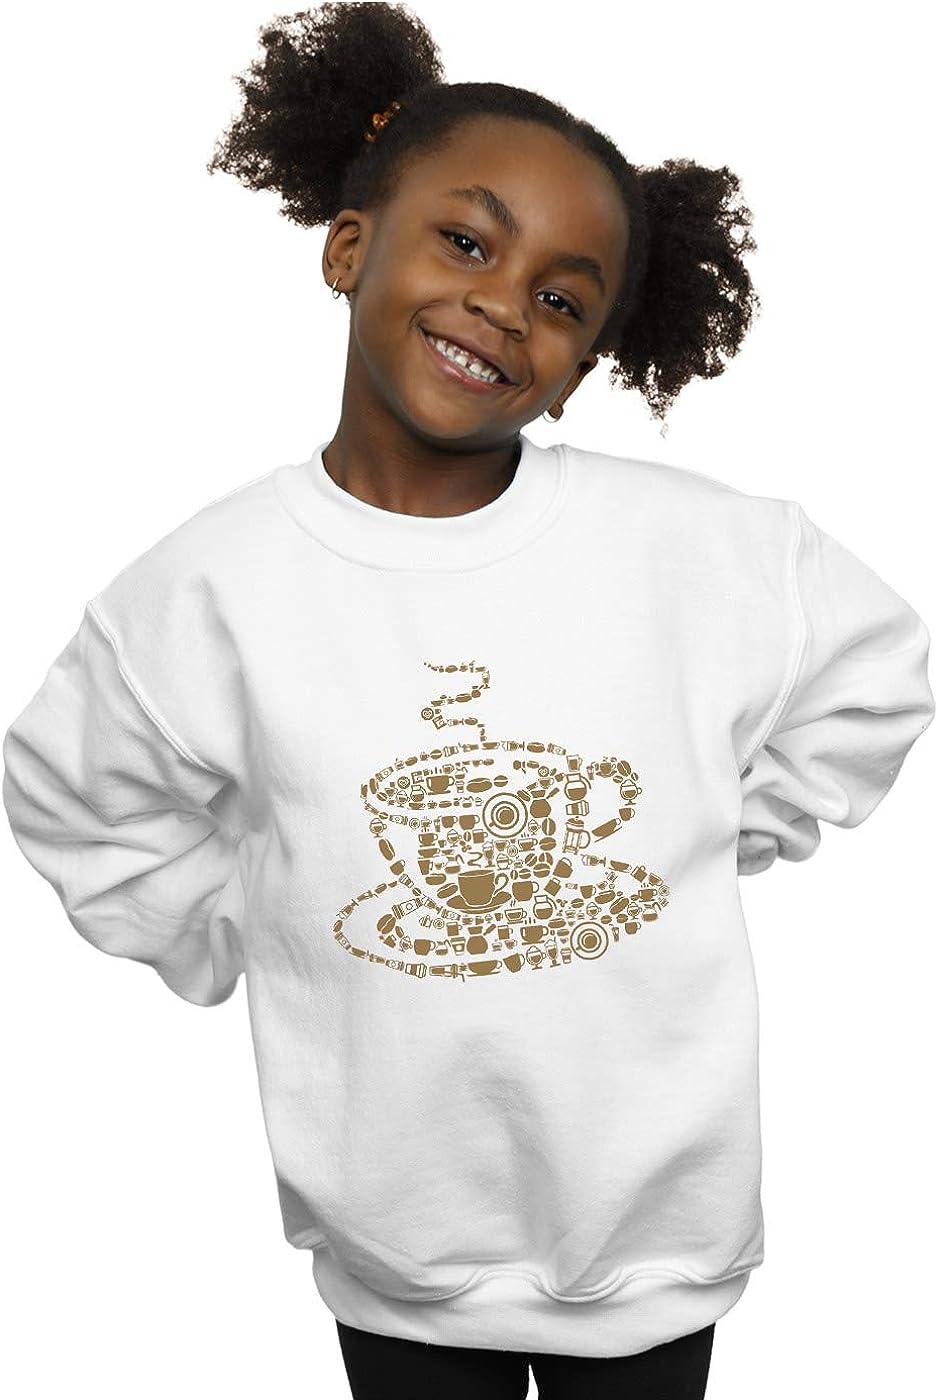 ABSOLUTECULT Drewbacca Girls Coffee Cup Sweatshirt